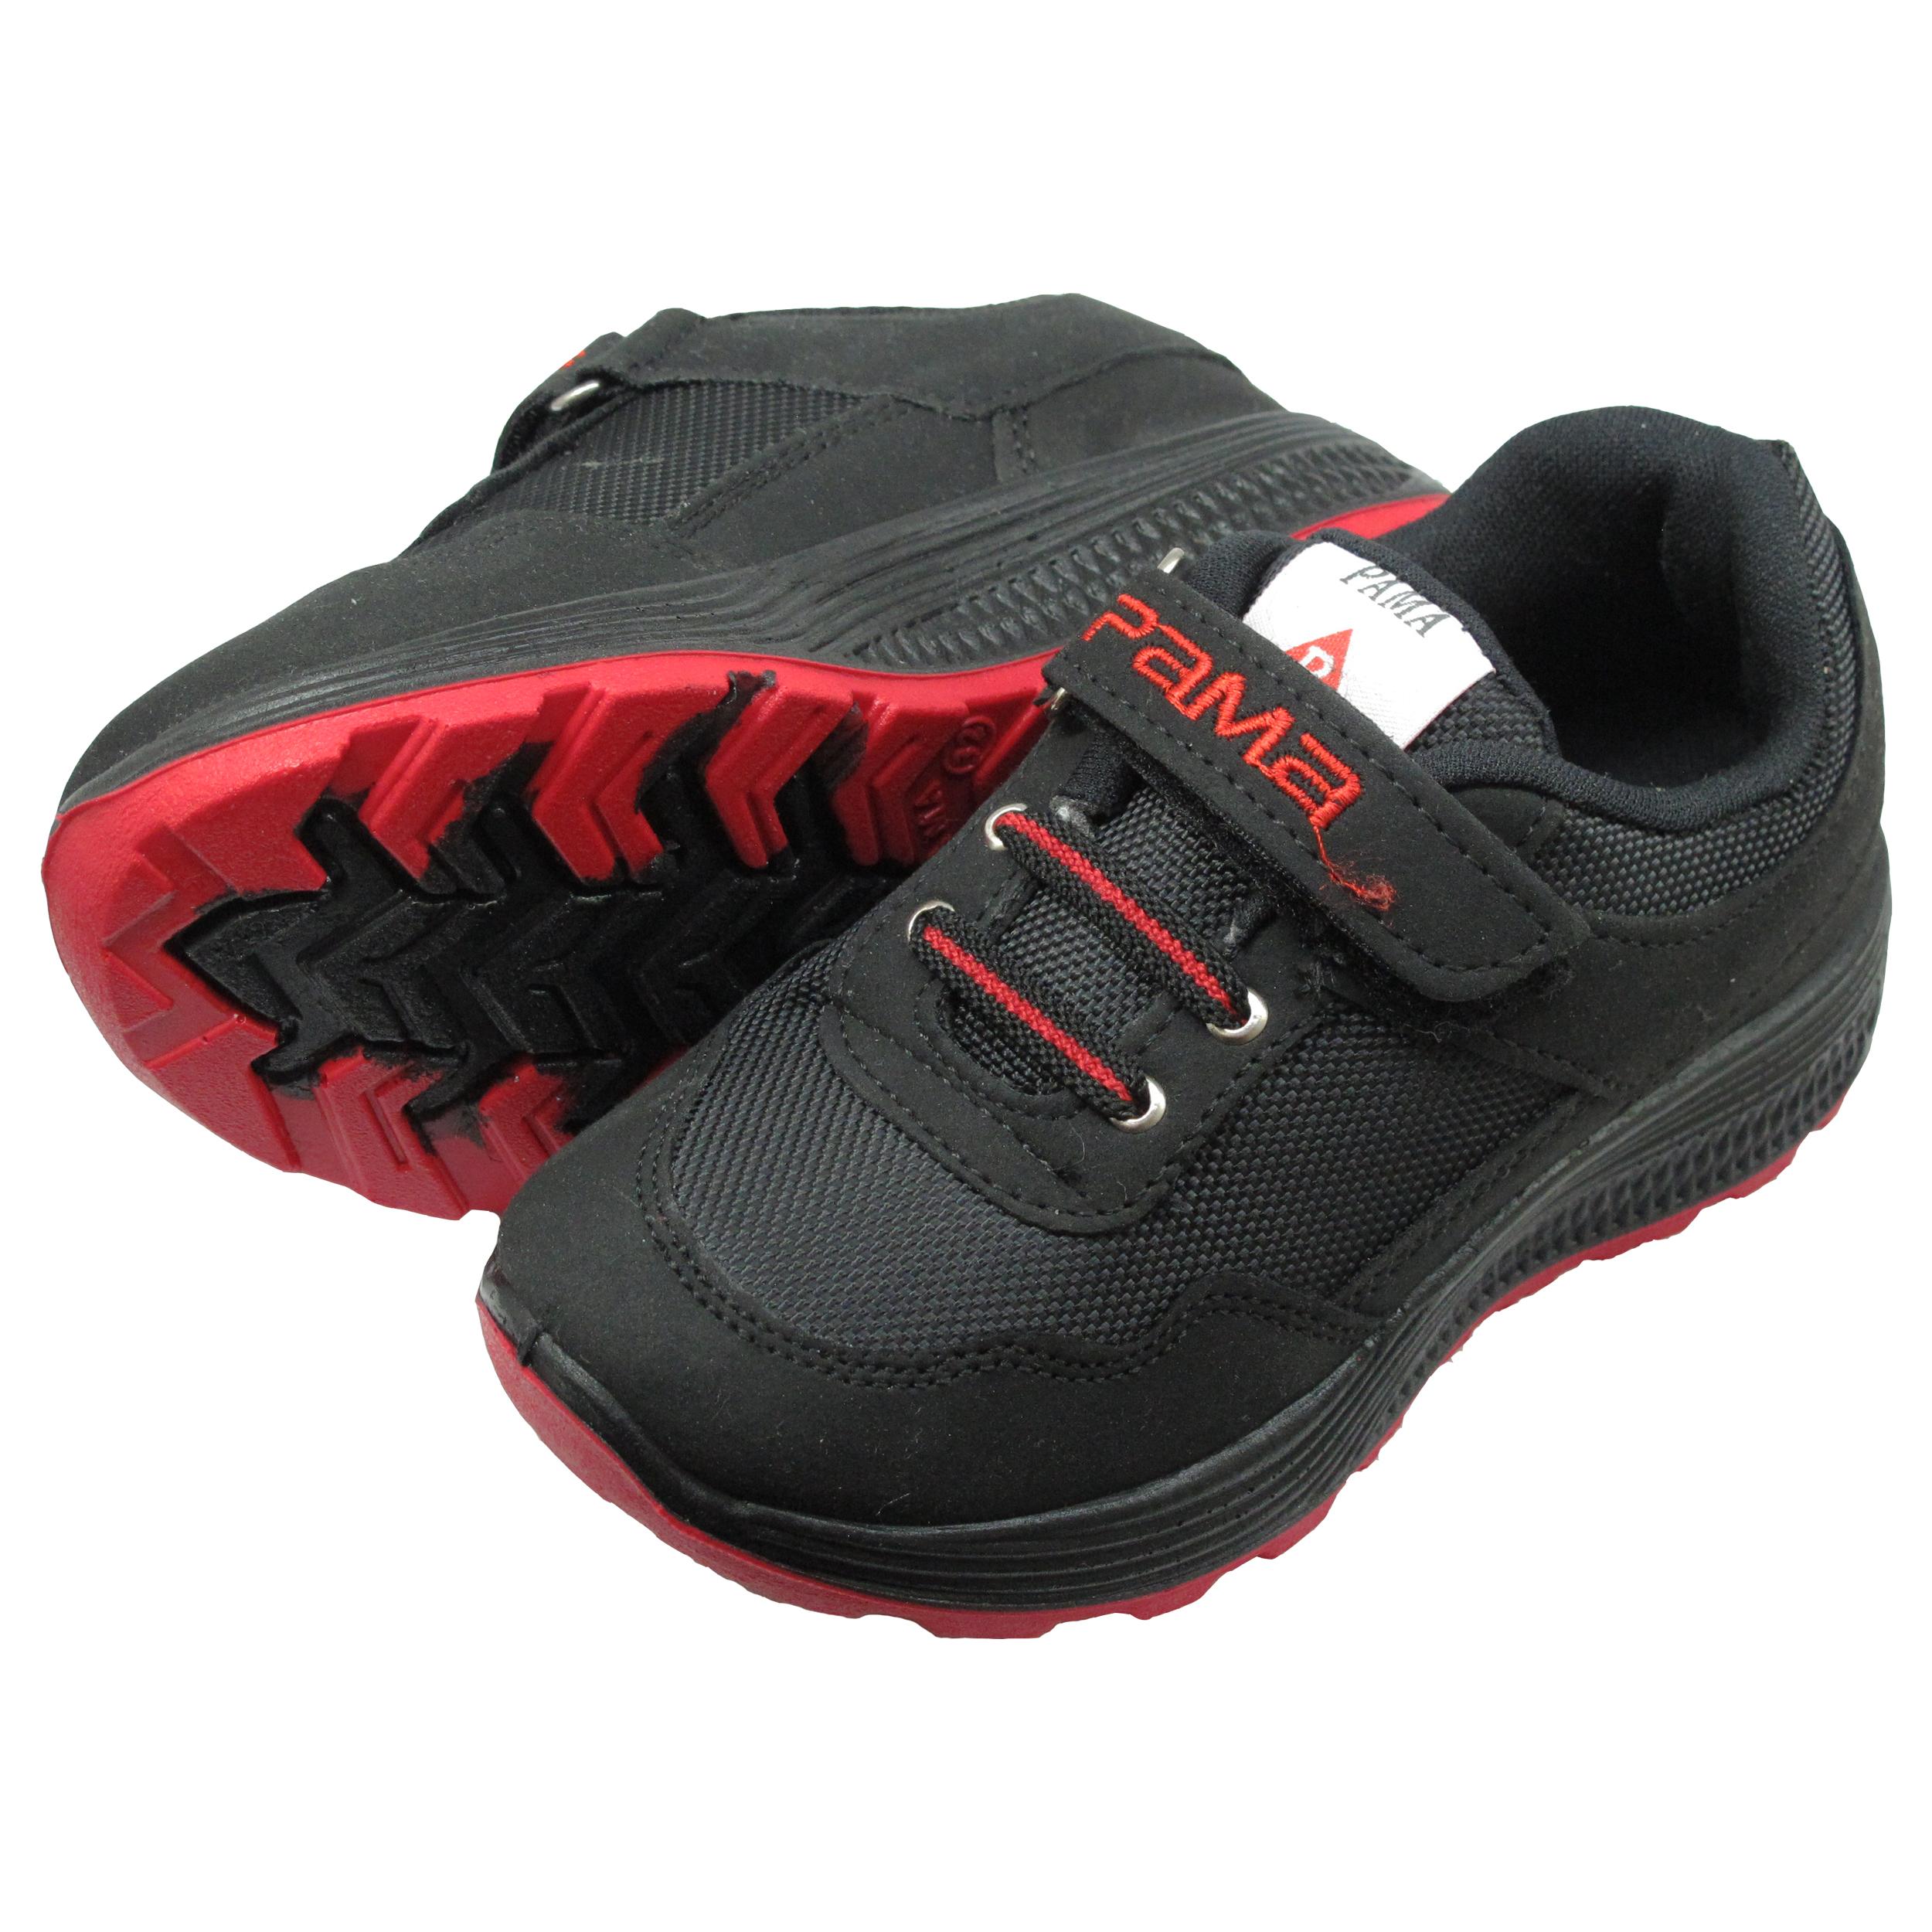 کفش راحتی پسرانه پاما کد 1357